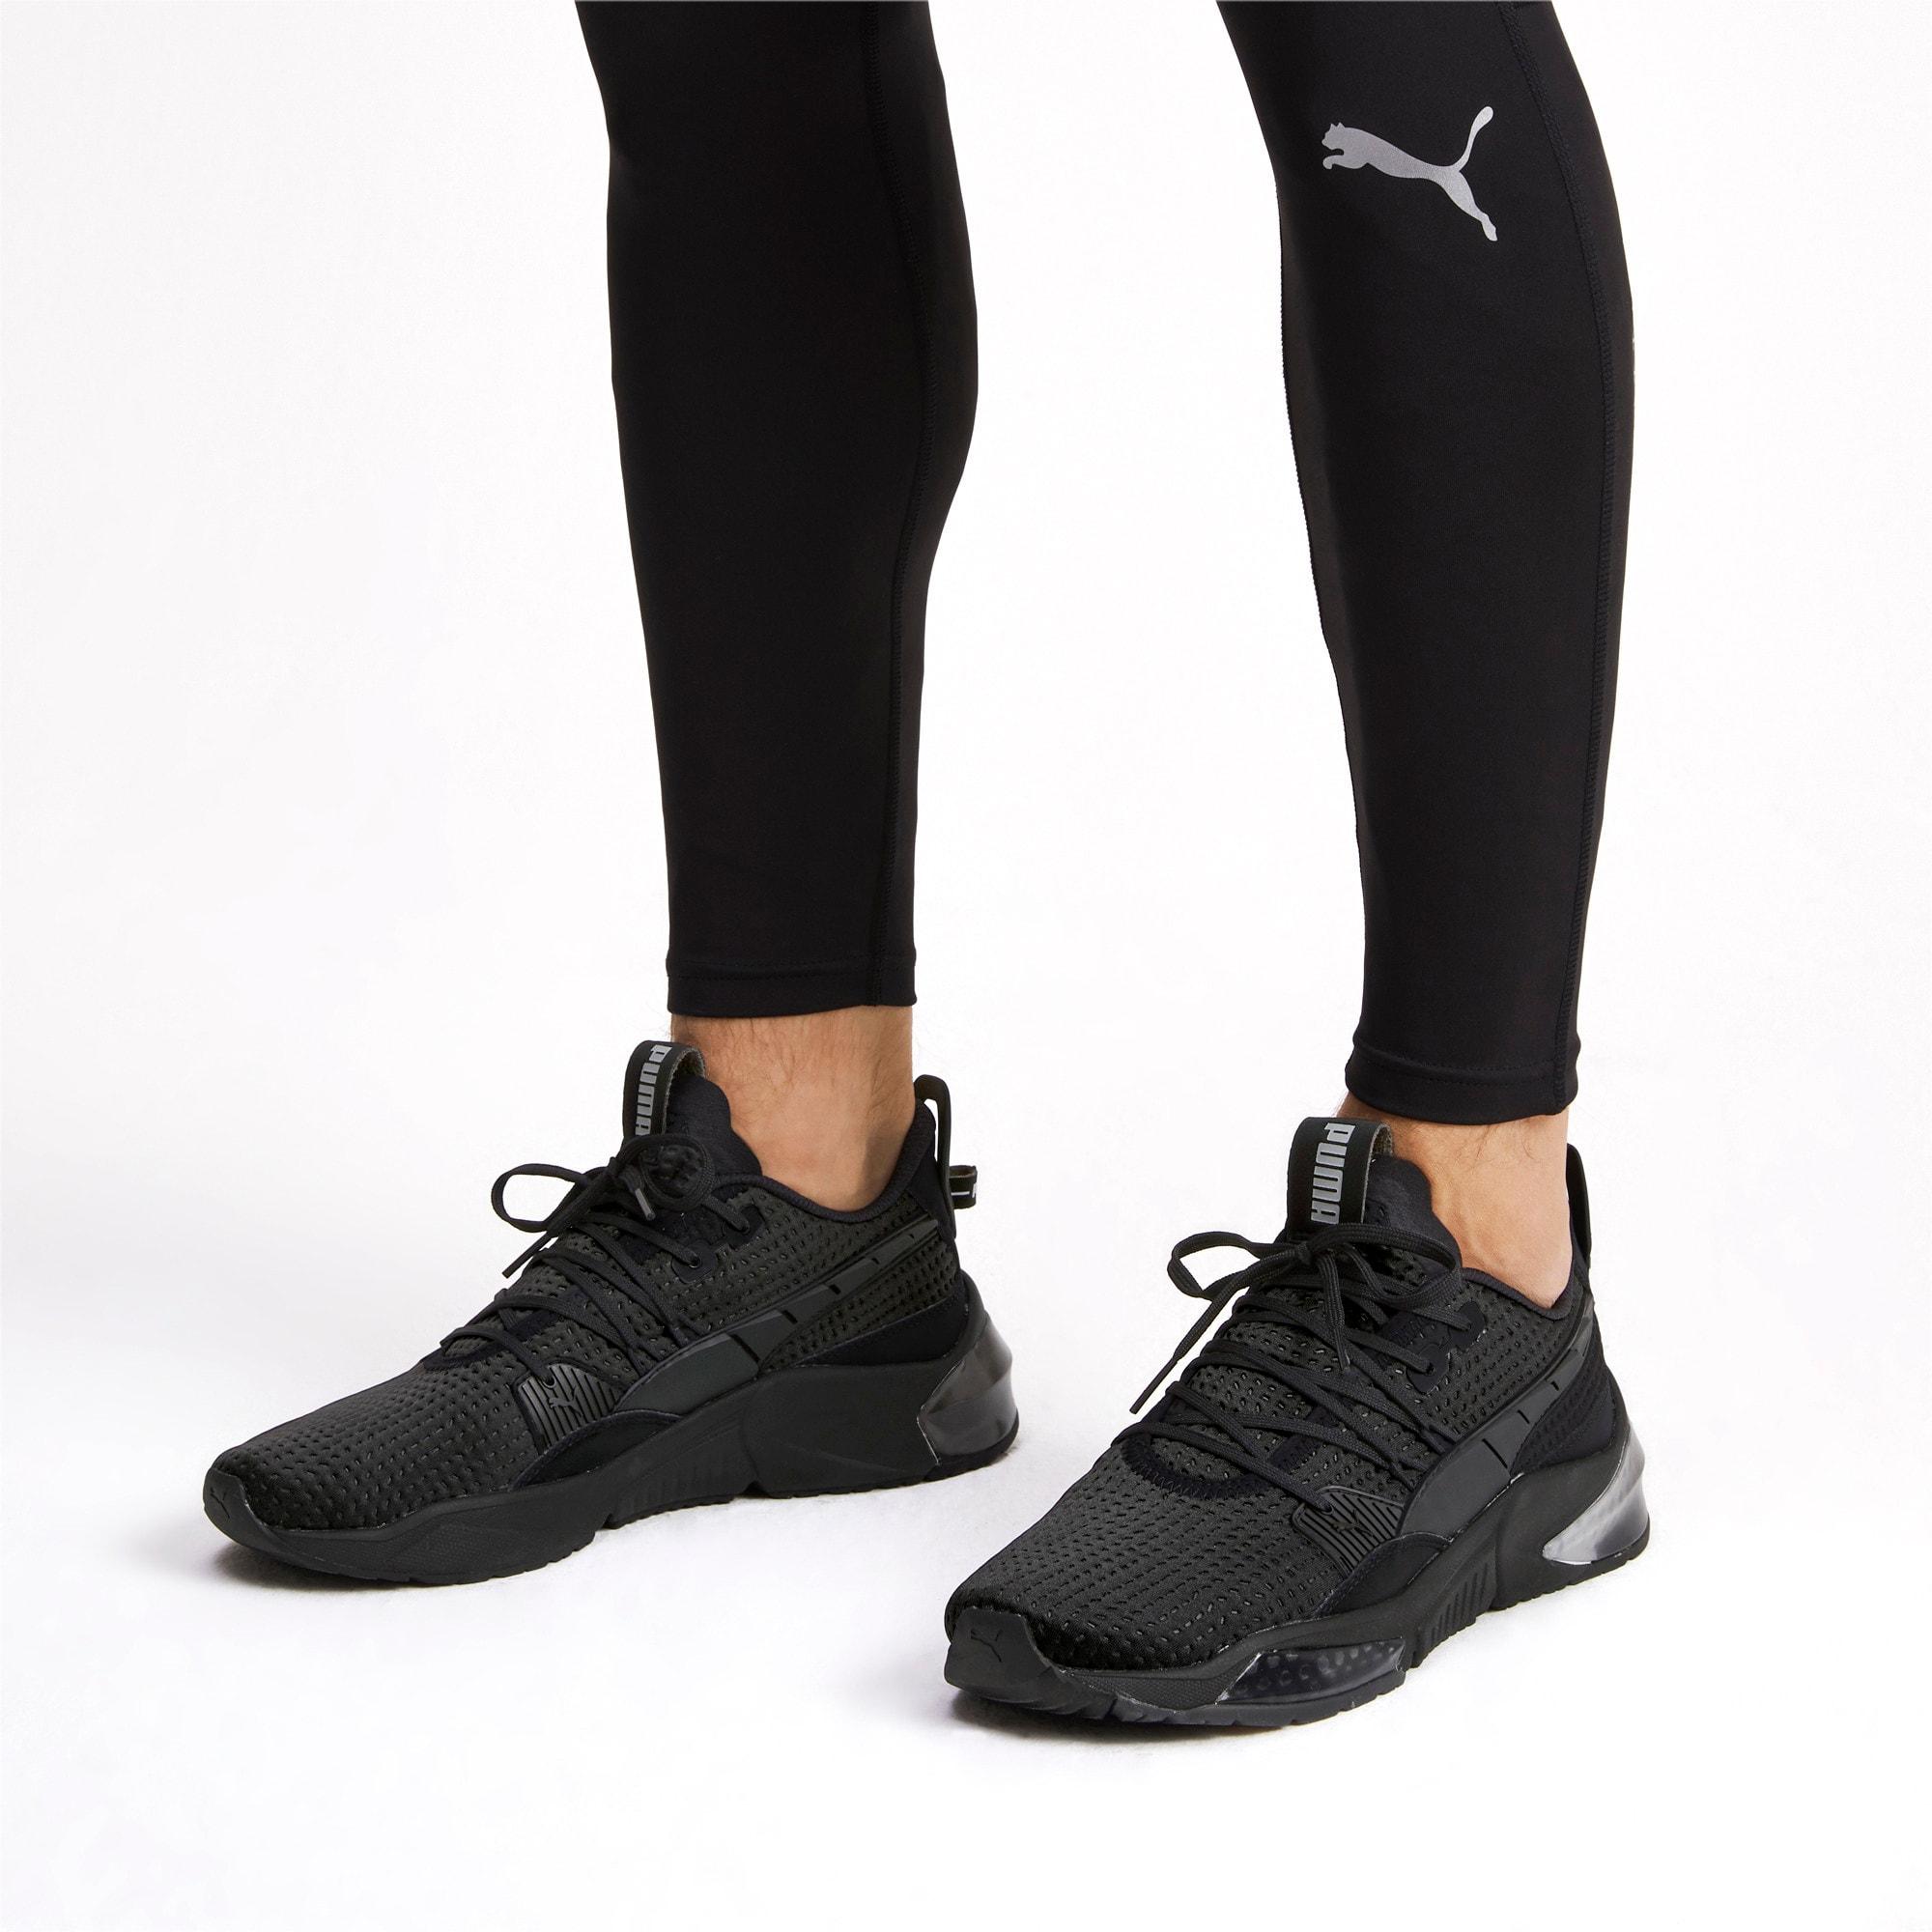 Thumbnail 3 of LQDCELL Optic Flight Suit Men's Running Shoes, Puma Black, medium-IND